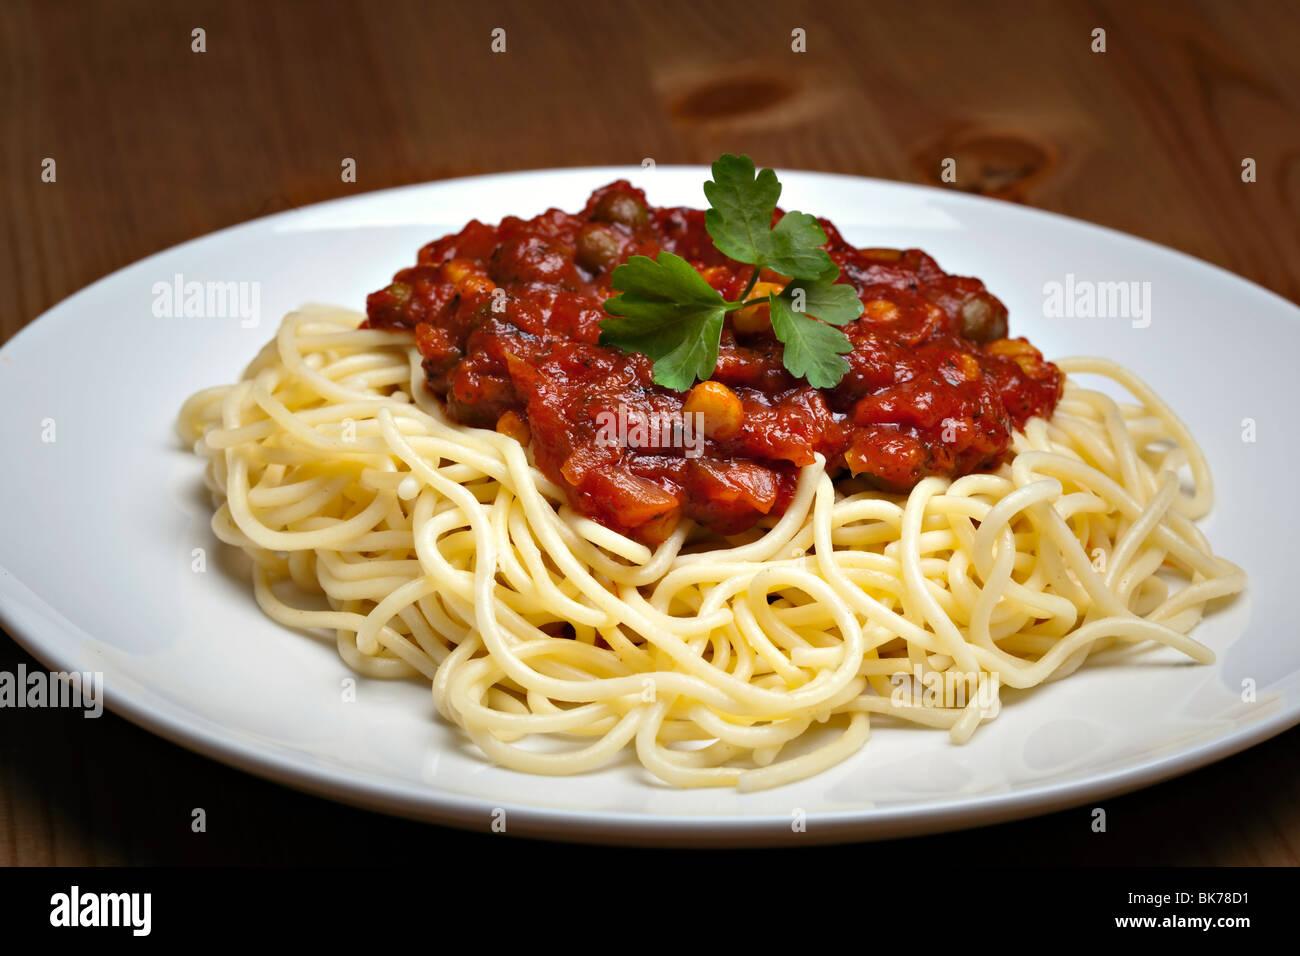 Spaghetti bolognese, traditional italian food - Stock Image